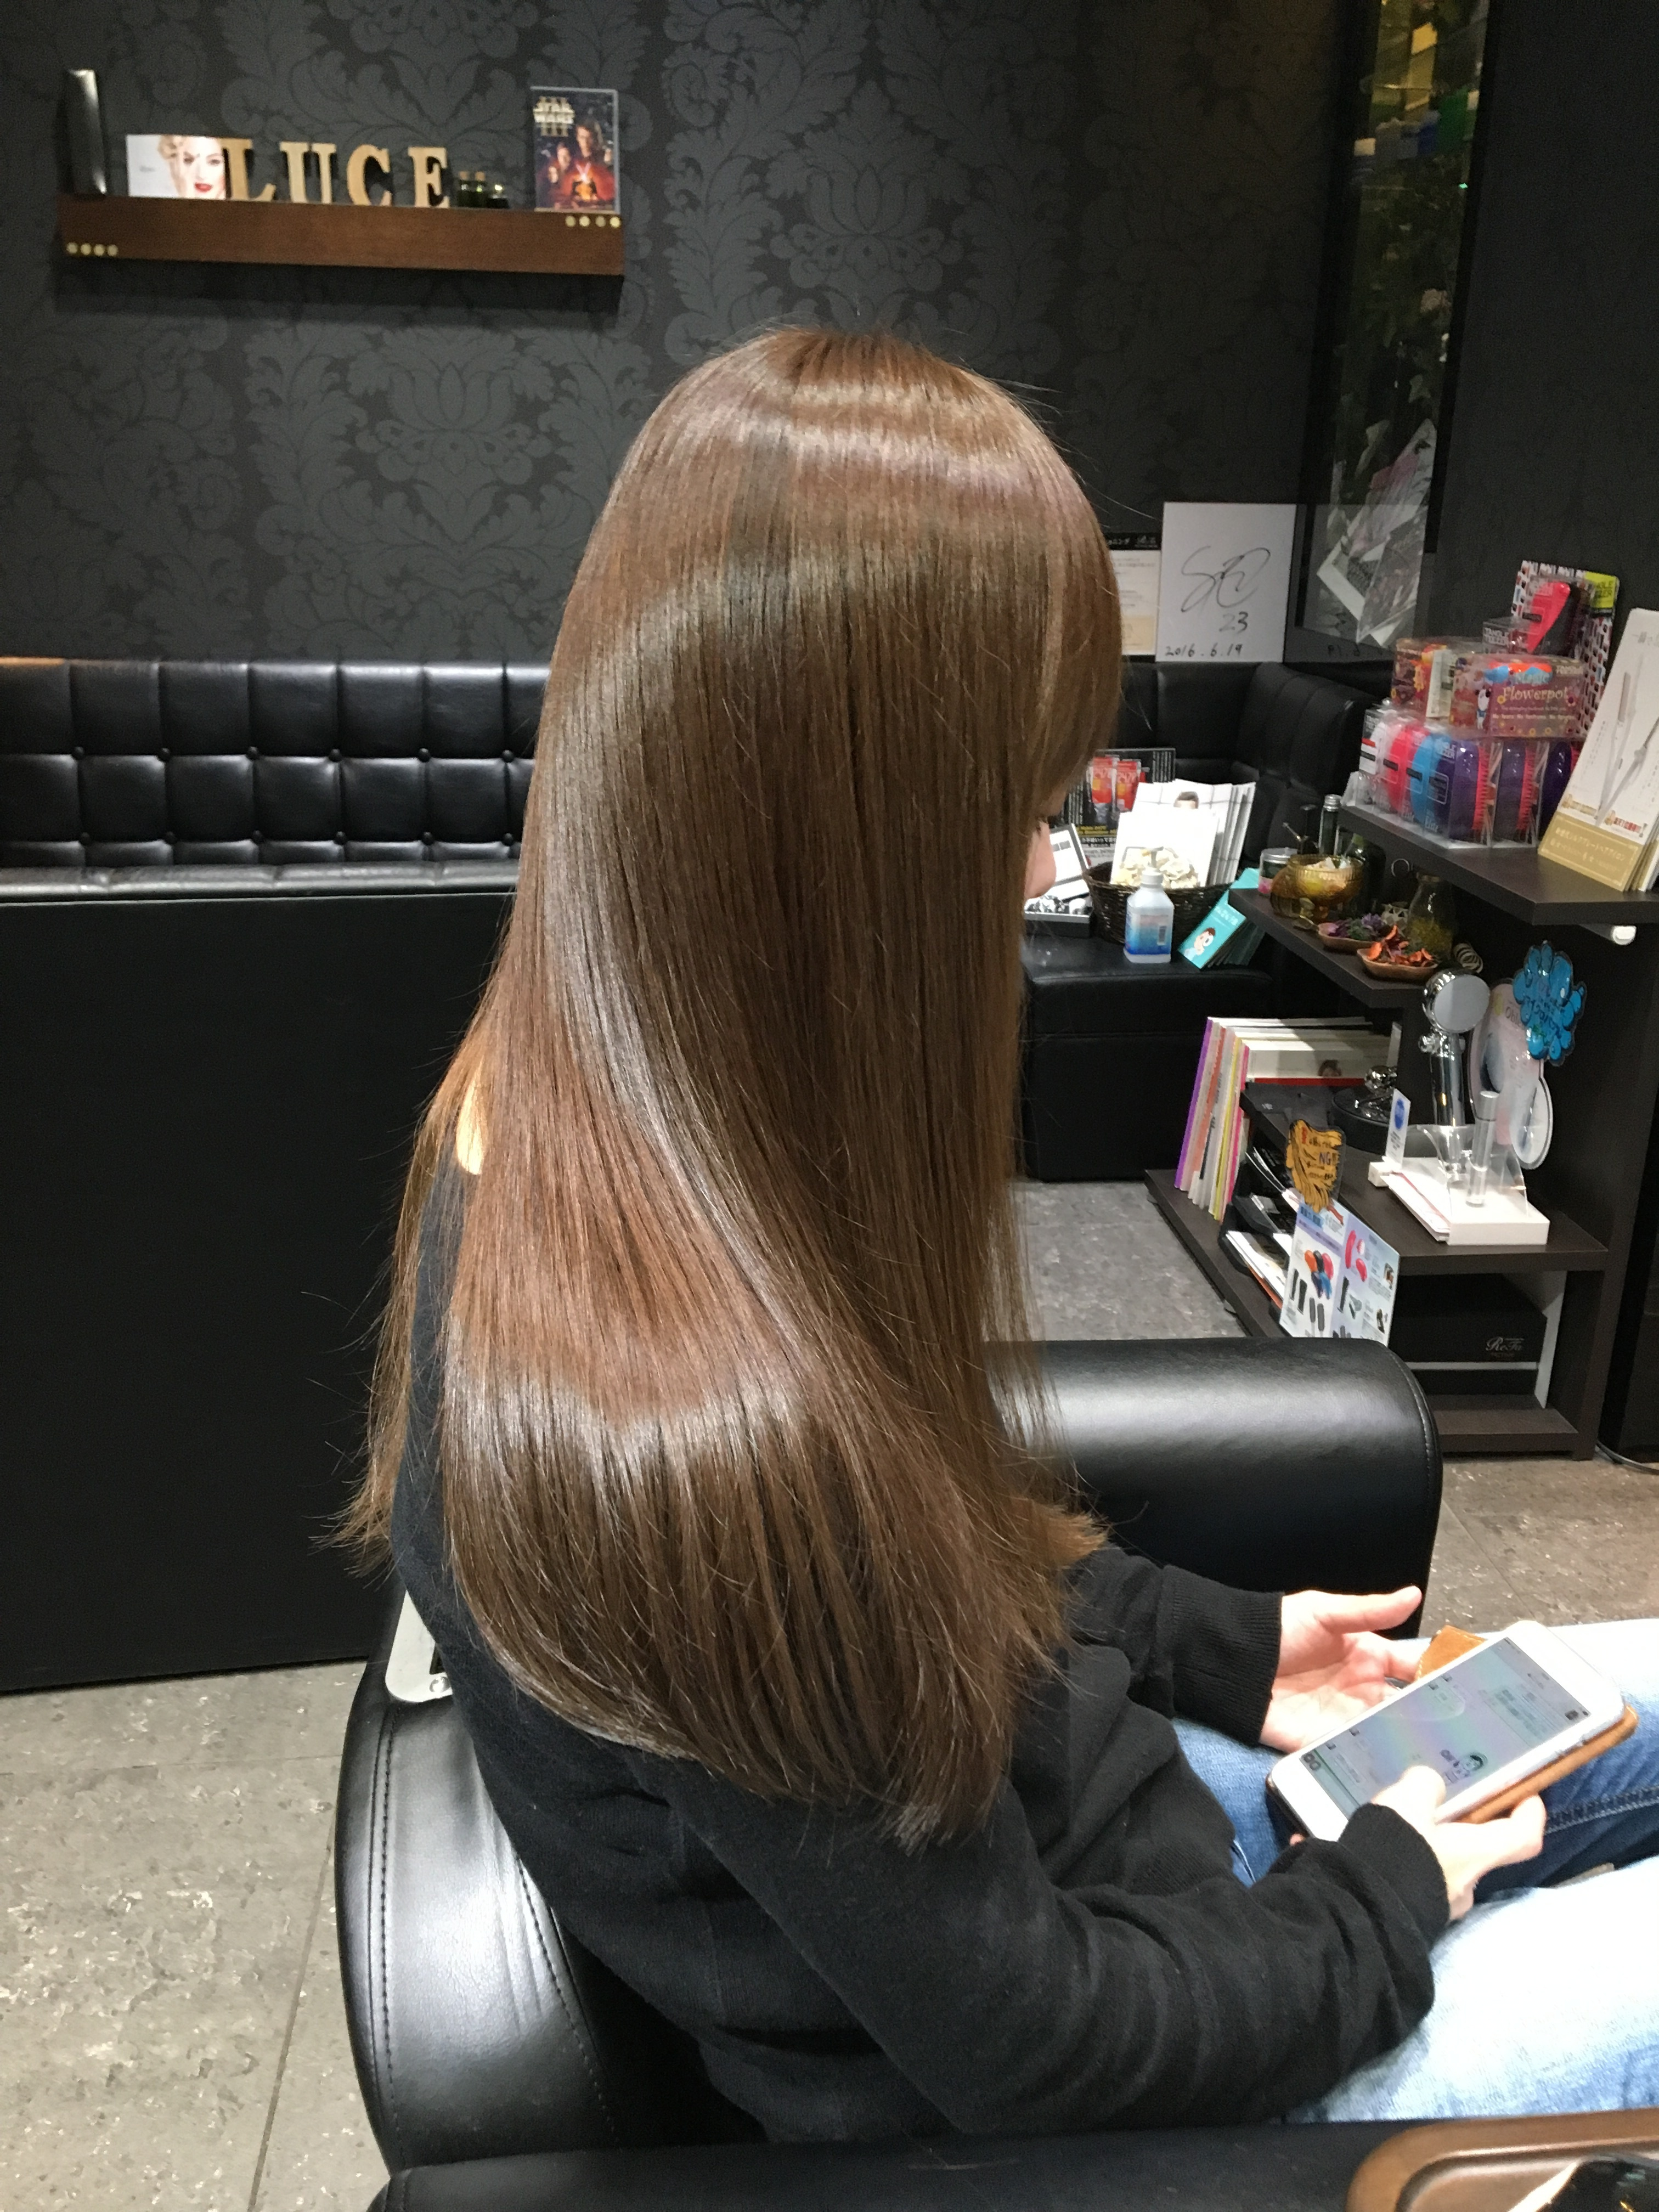 Luce Hair design [Luce Hair Design